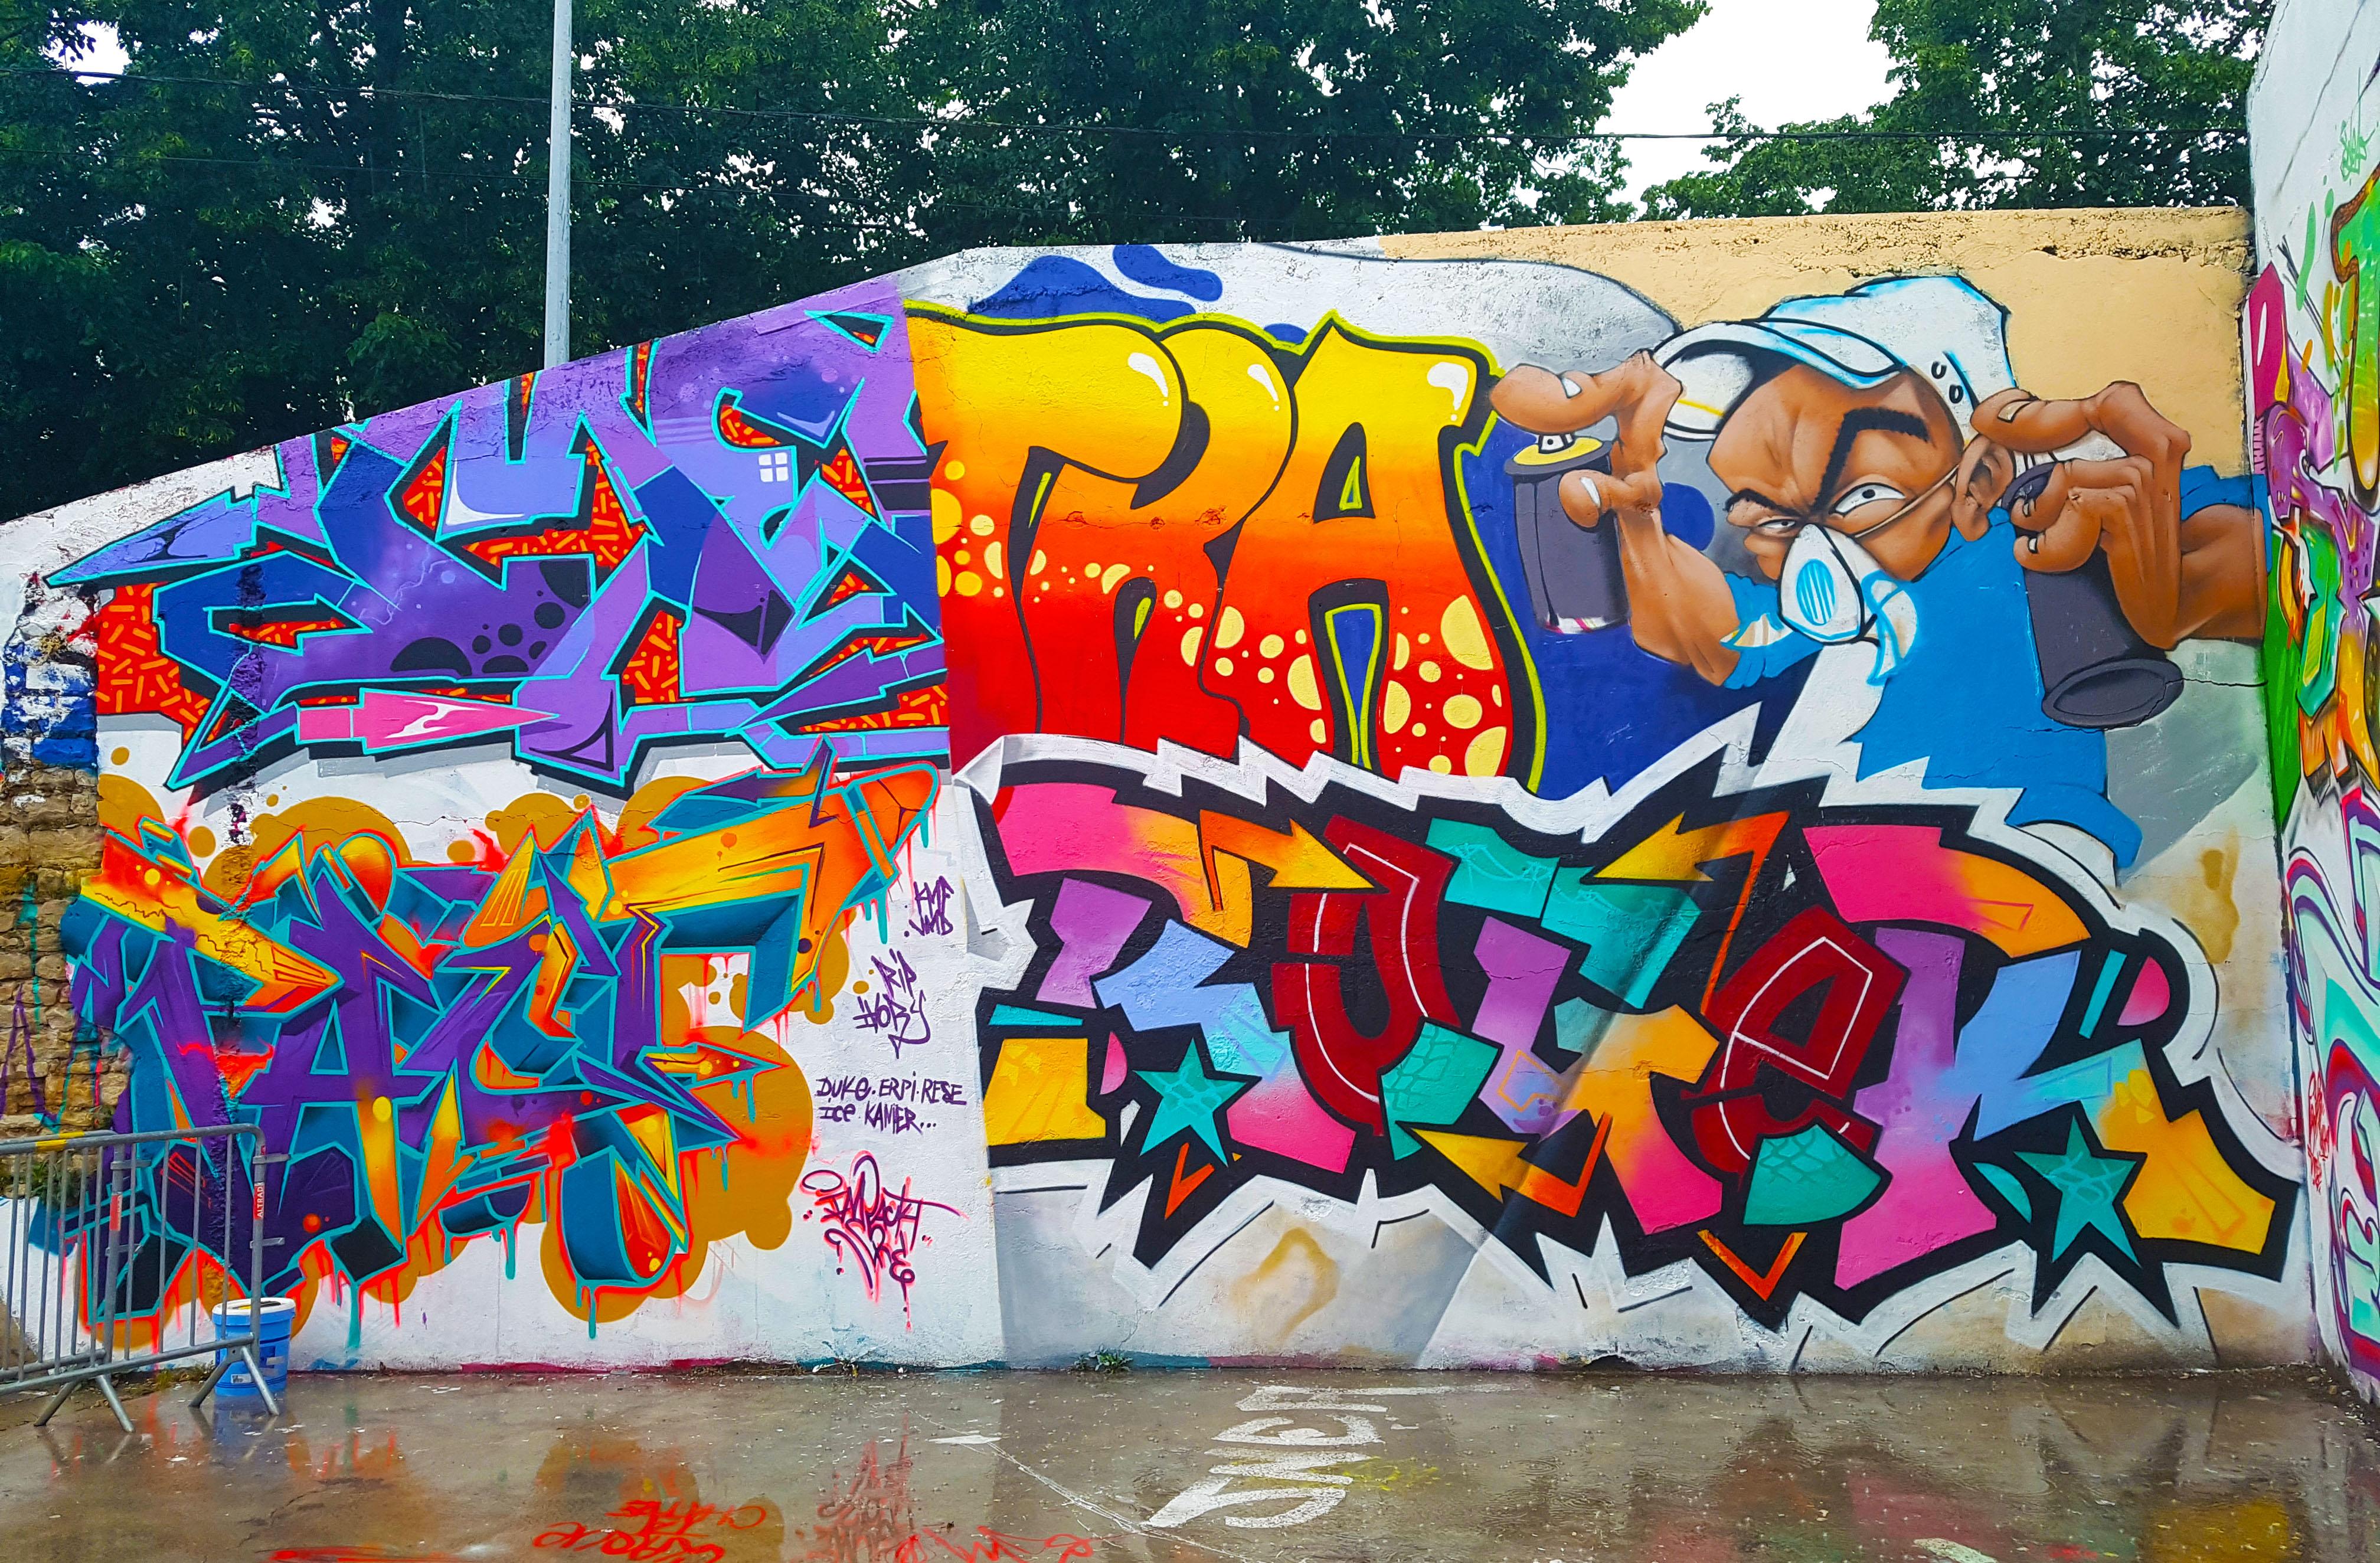 Où voir du street art à Bourg-en-Bresse ?